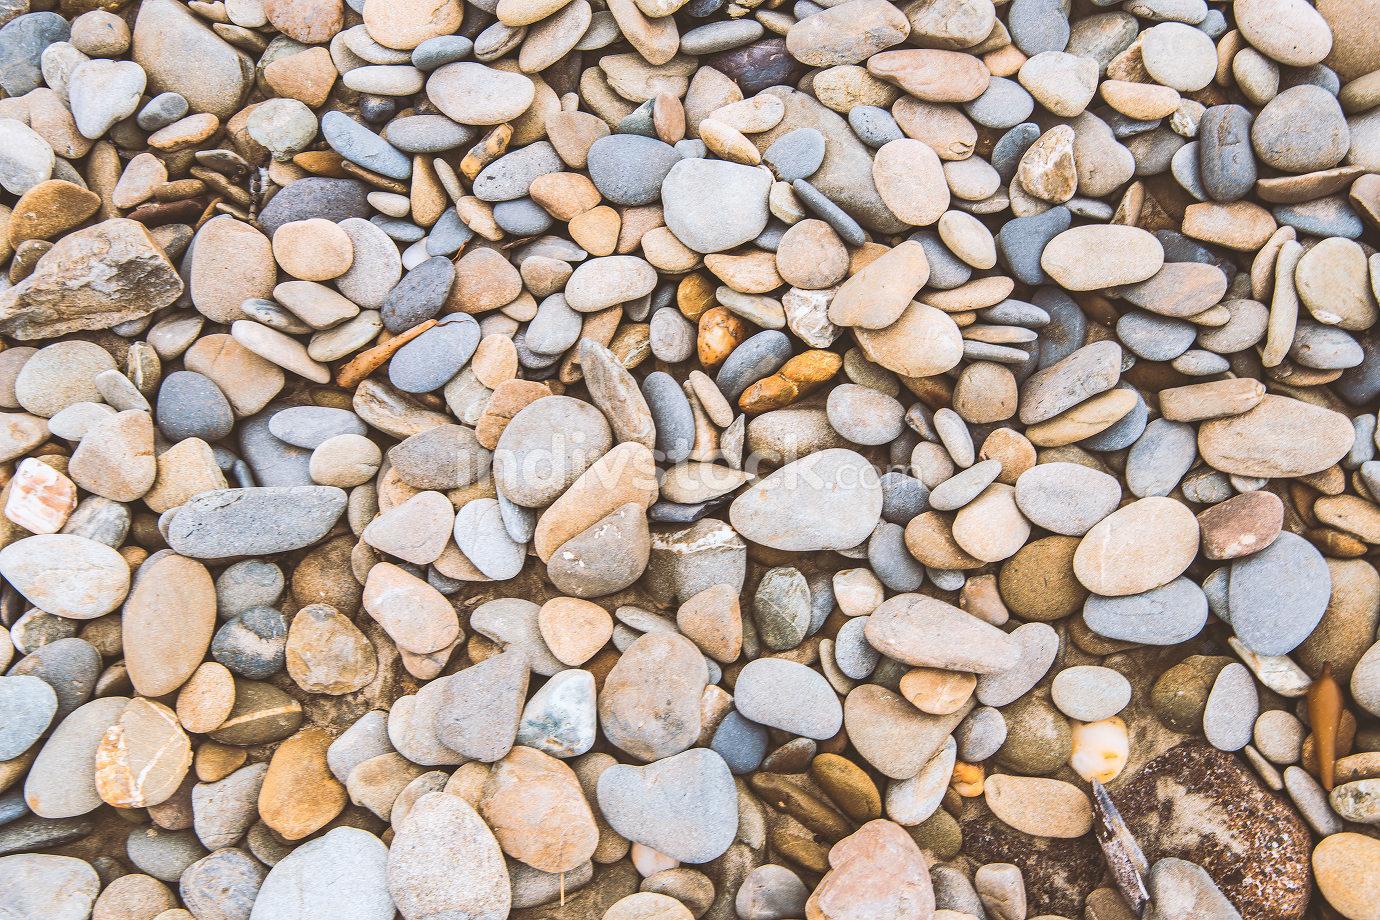 stone wall texture photo, stone background , stone floor texture, white stone floor in the garden, white stone wall background,white stone wall texture,white stones in the park